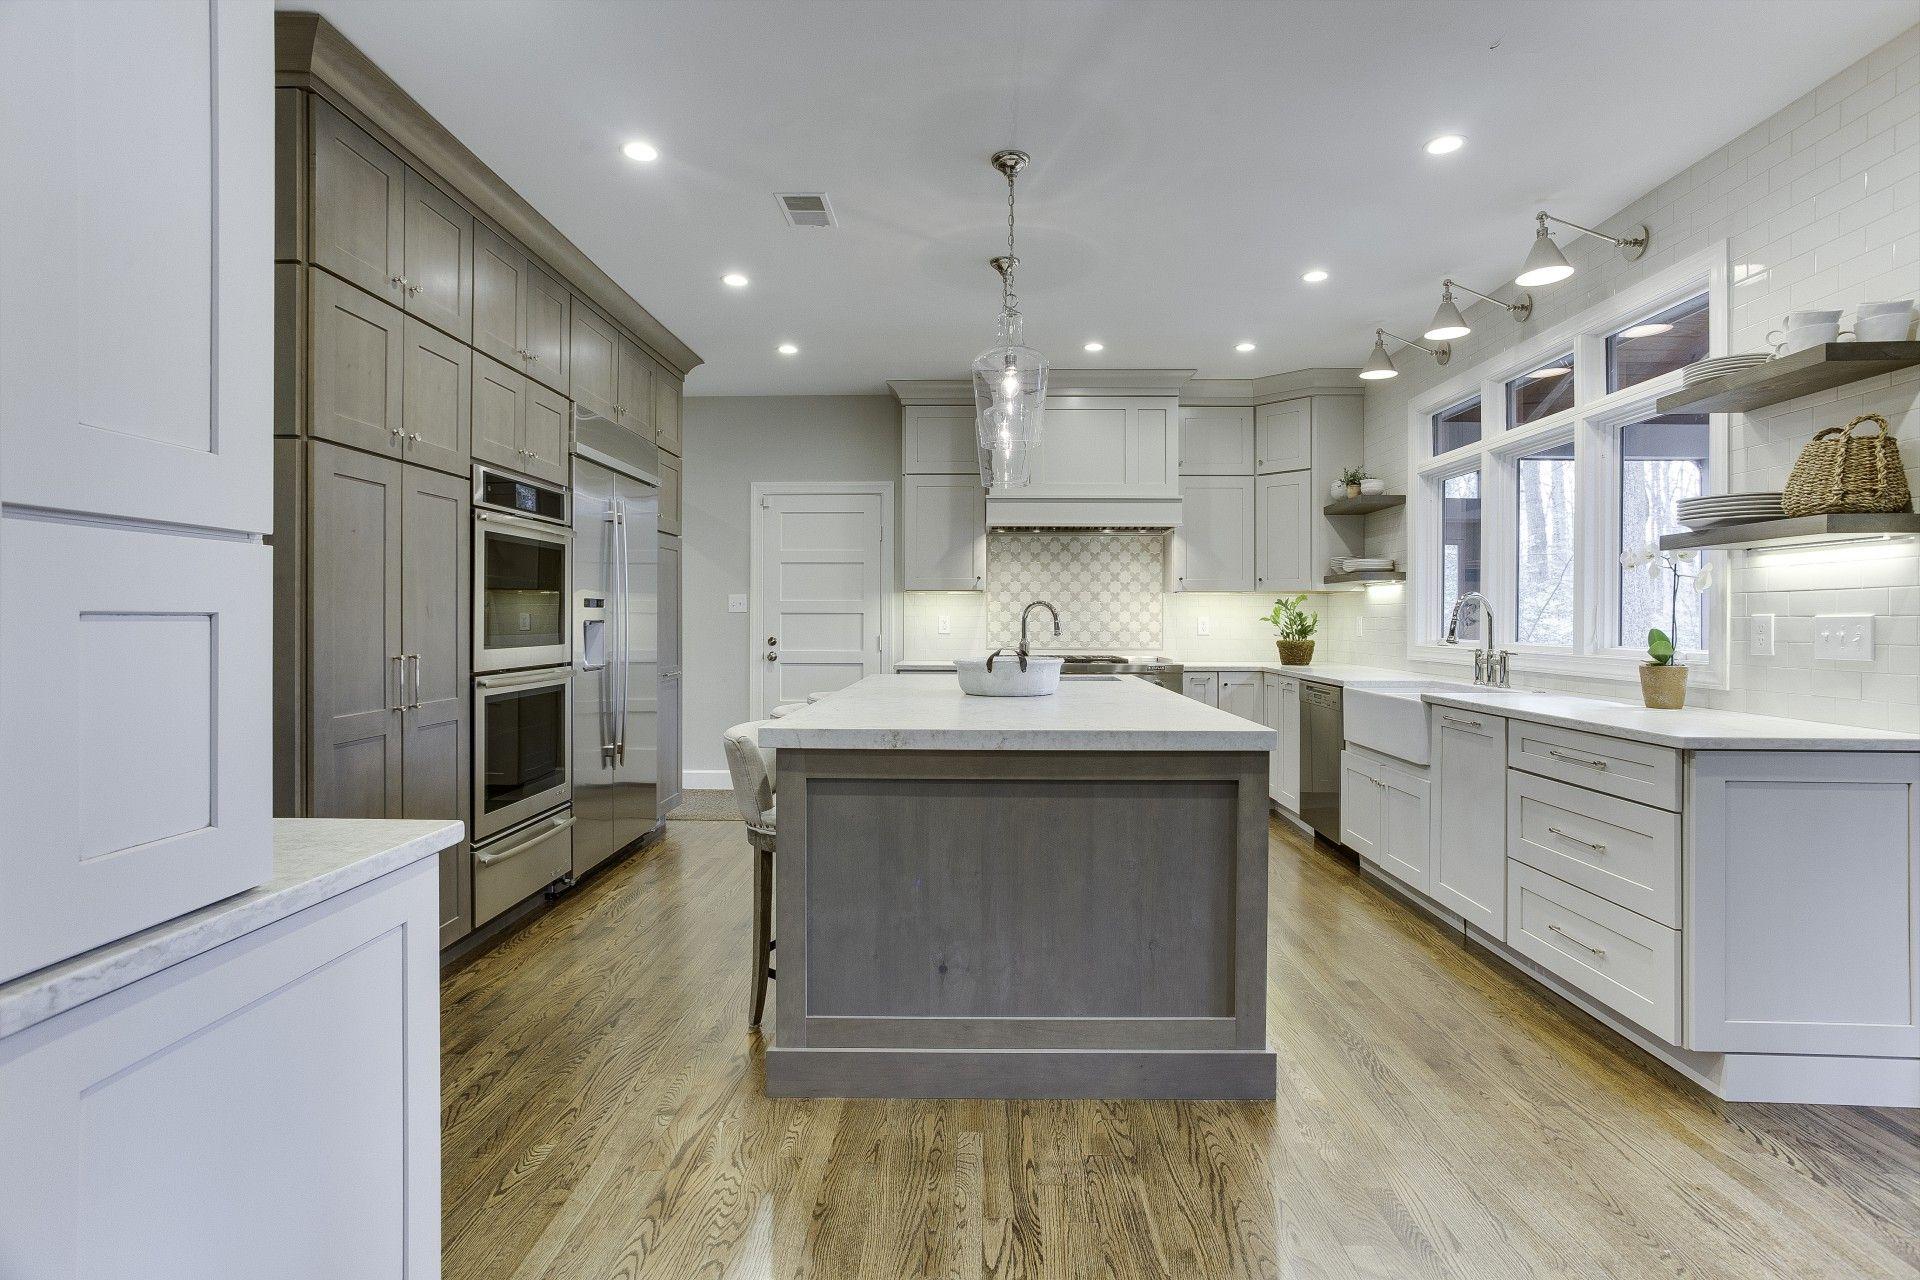 Kitchen Remodeling Ideas Home Renovation Kitchen Trend 2019 Ea Home Design Remodeling Company Kitchen Trends Kitchen Remodel Design Remodel